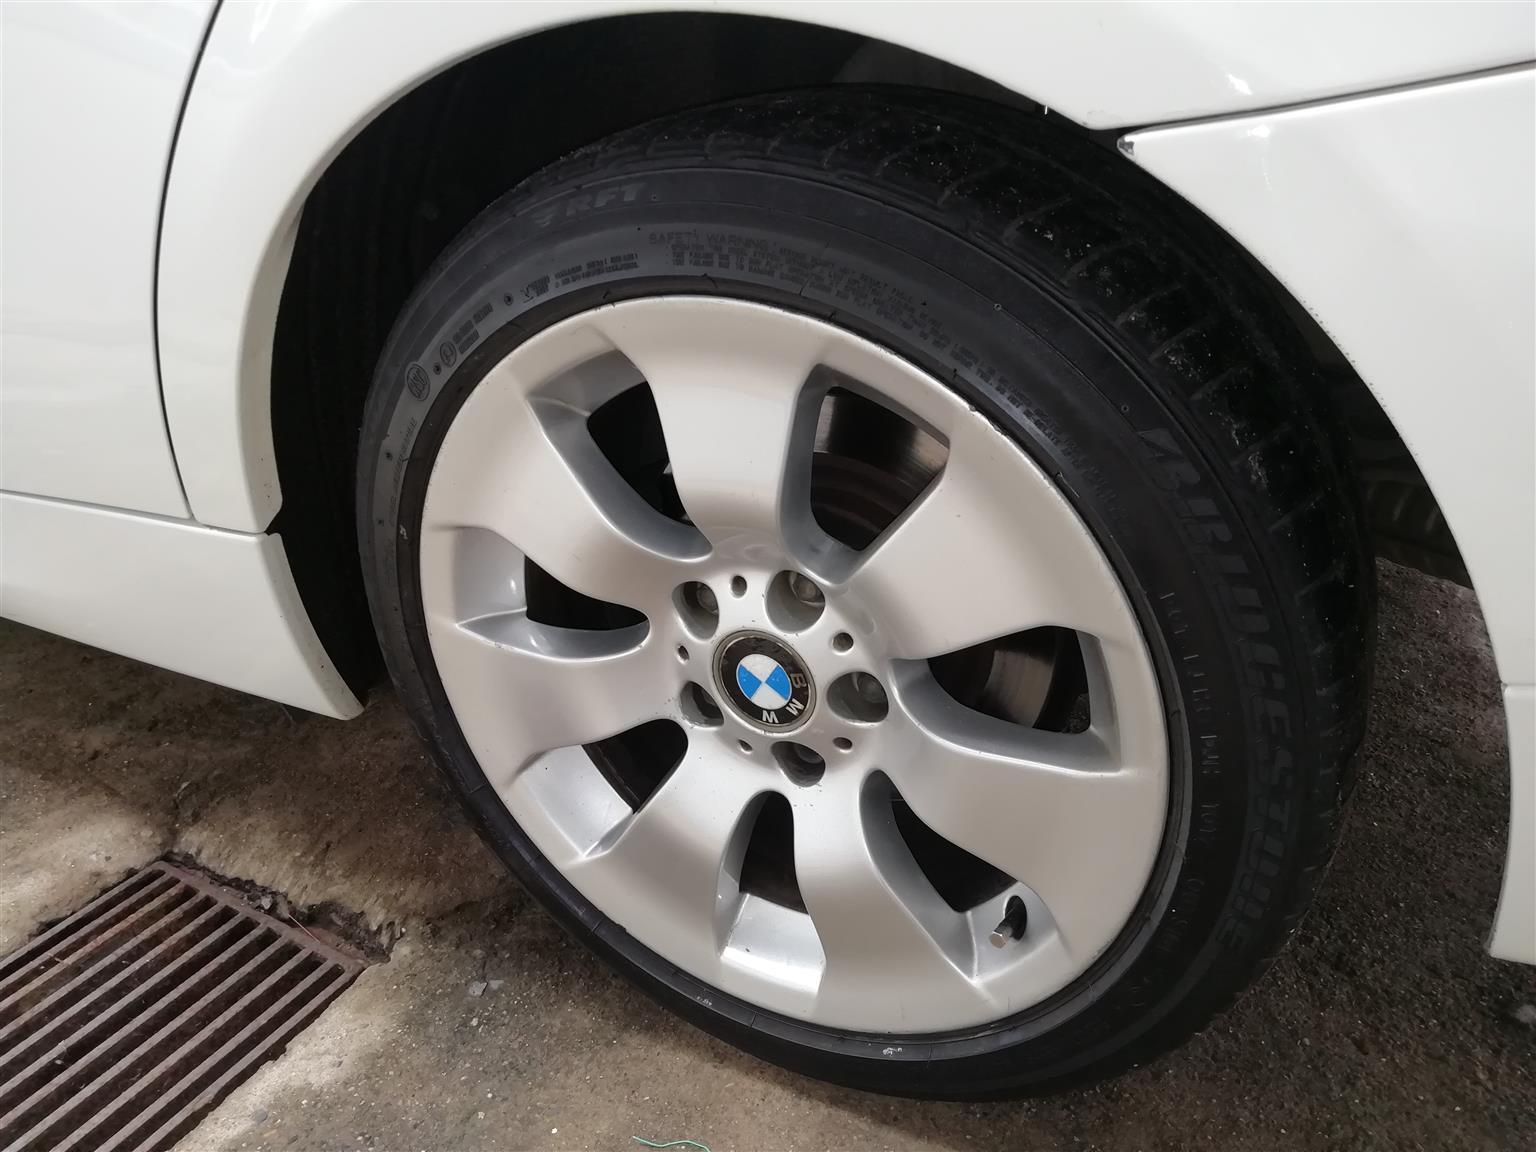 17 inch BMW Rims & Tyres